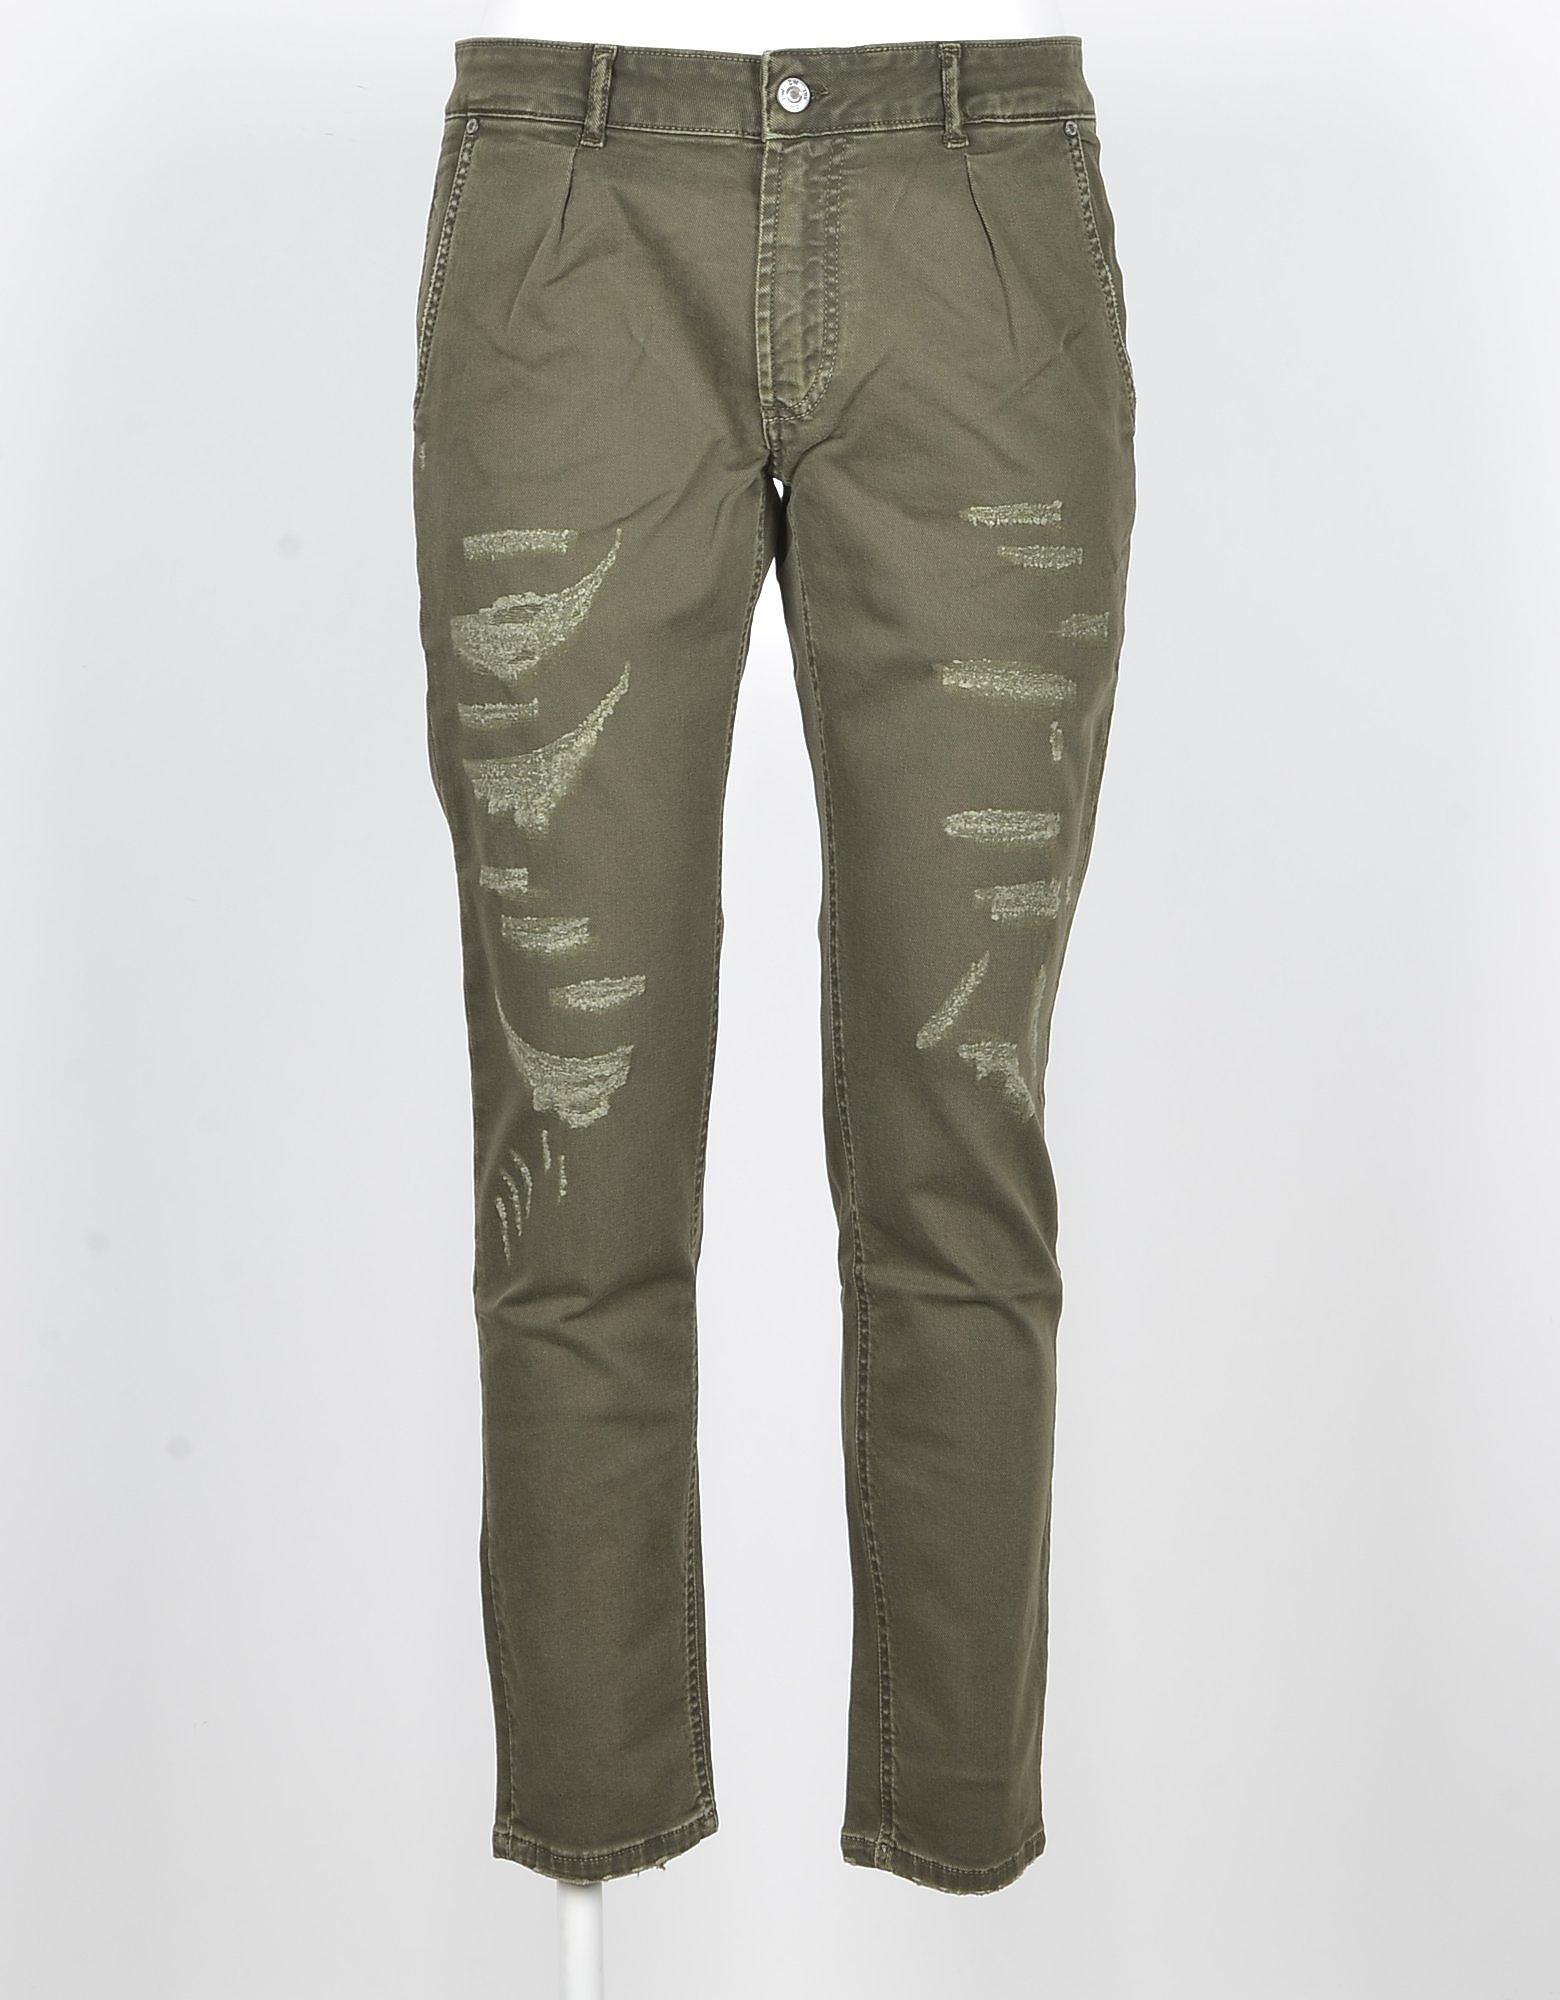 Dw Five Designer Pants, Men's Green Pants